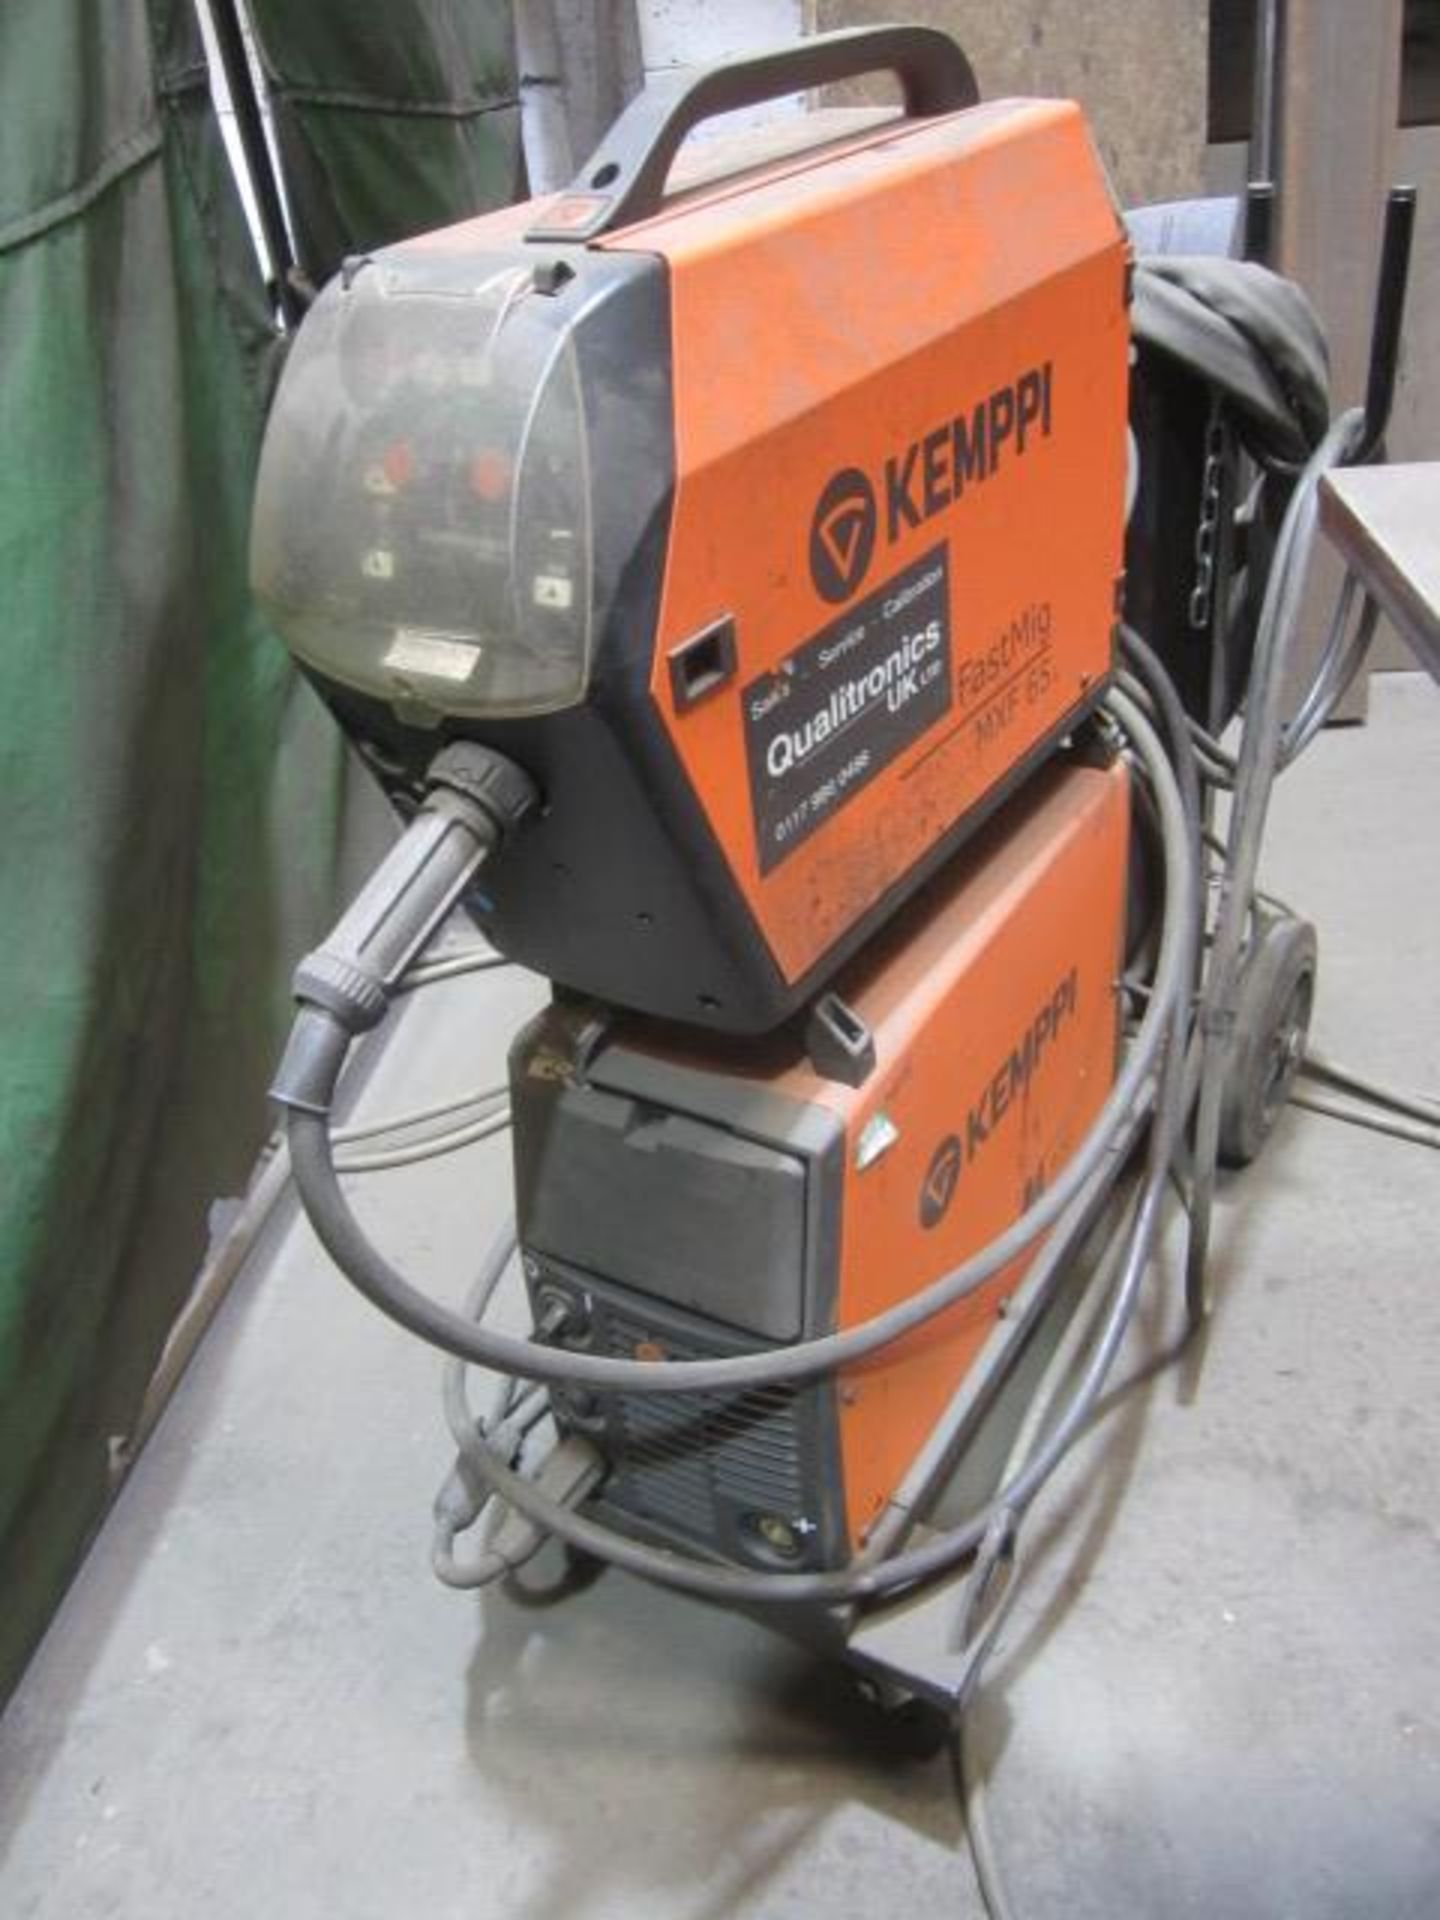 Kemppi Fast Mig M420 mig welder, serial no. 2674175, with Fast Mig MXF65 wire feeder, serial no.